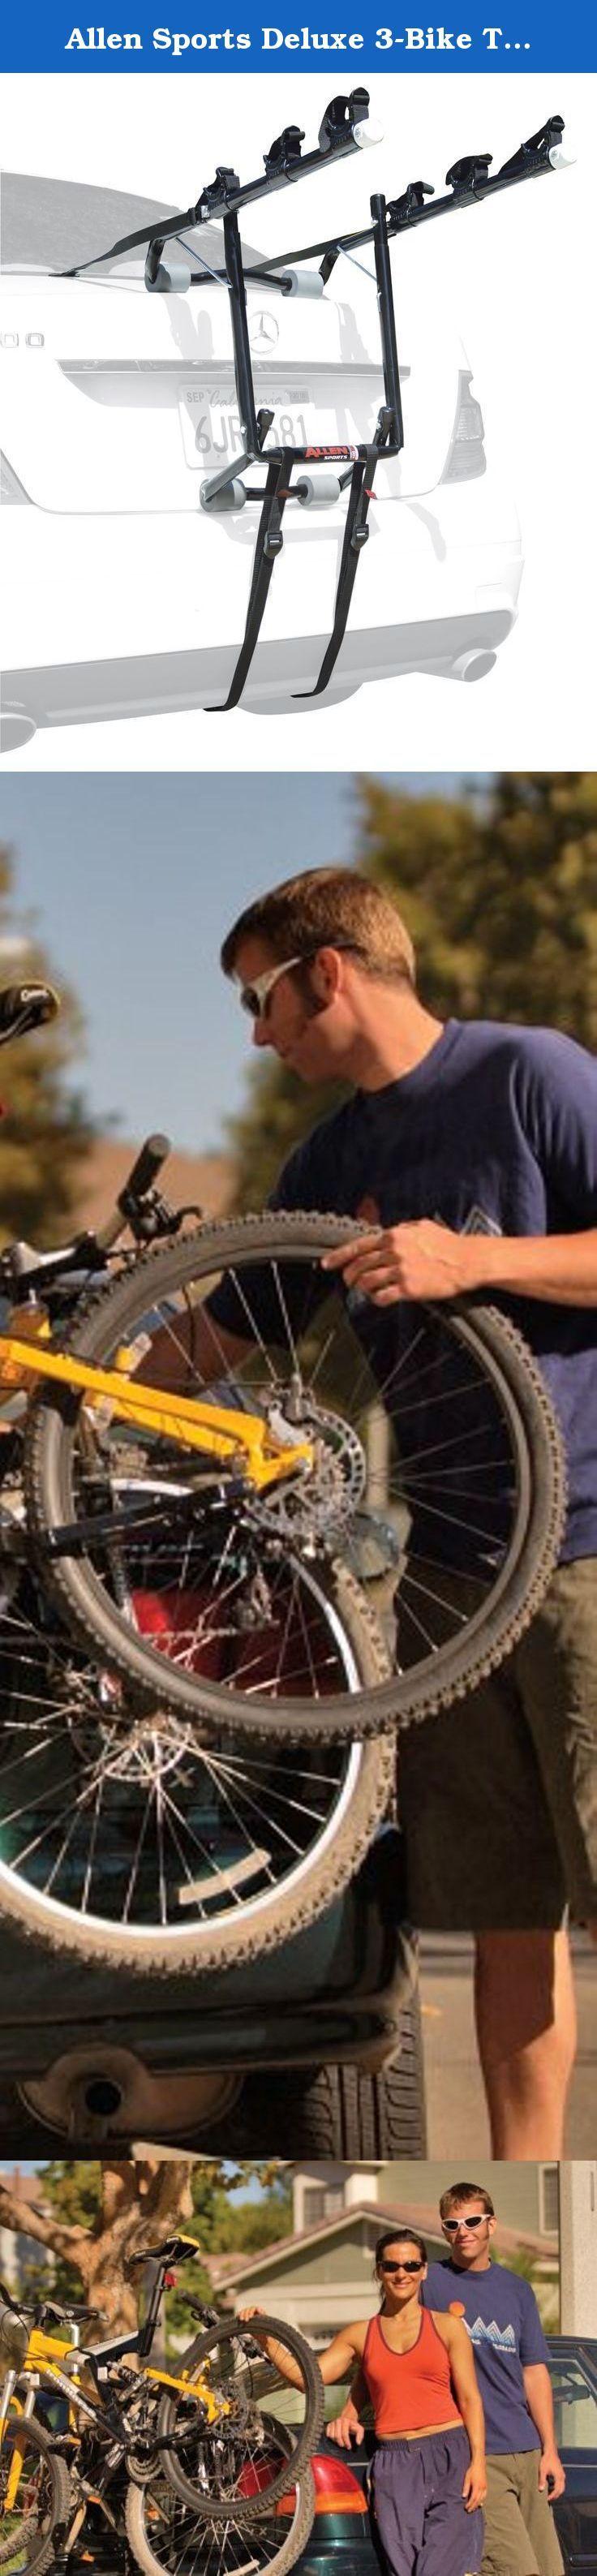 Allen Sports Deluxe 3-Bike Trunk Mount Rack. Fits sedans, hatchbacks, mini-vans & SUVs.